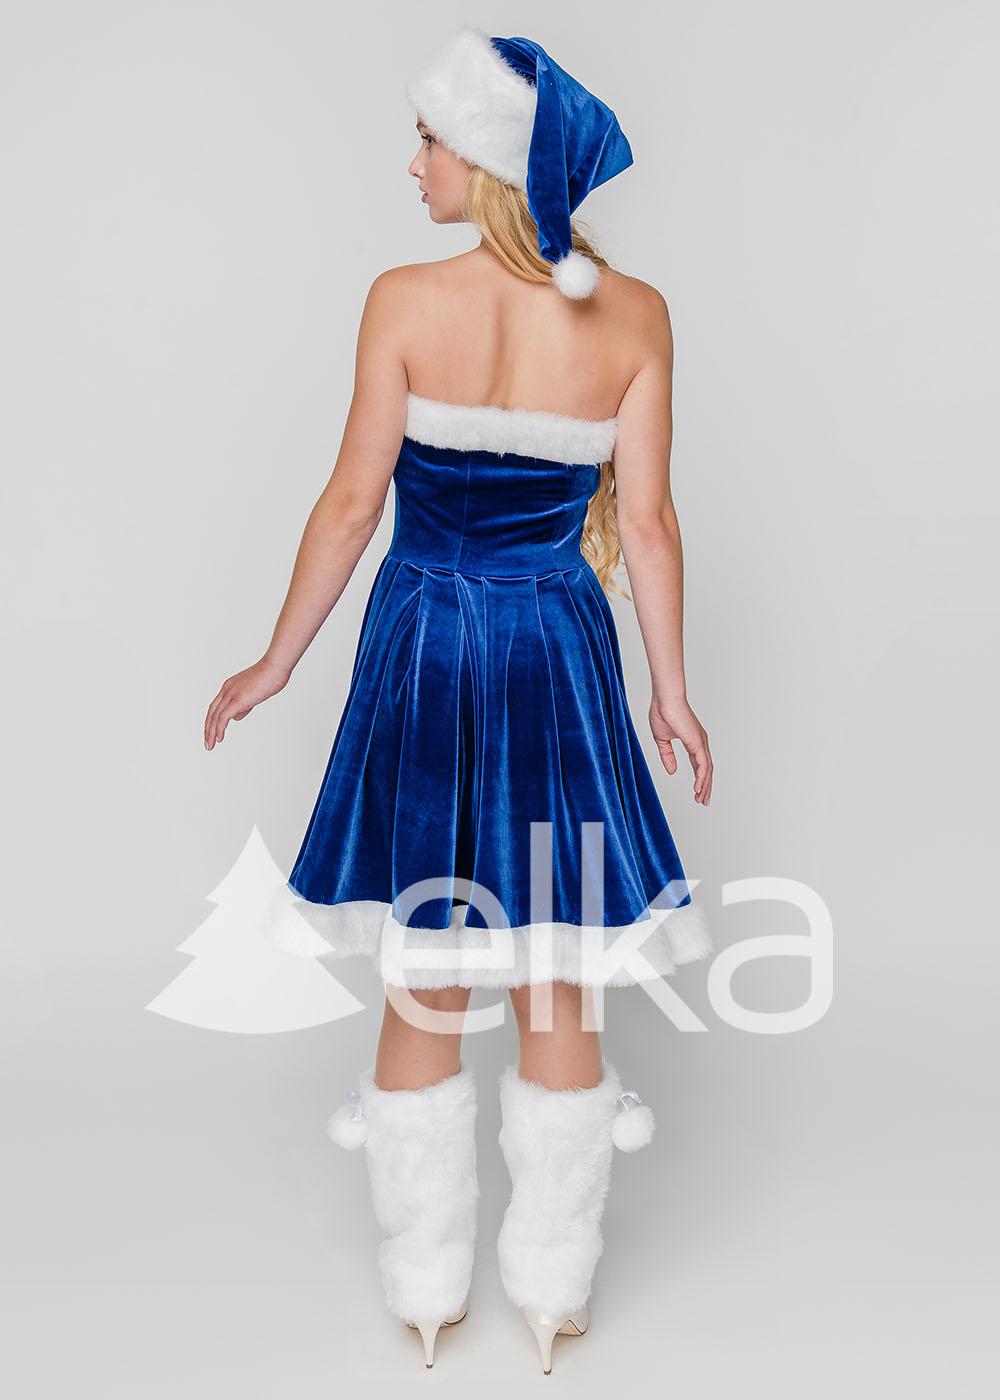 Костюм Снегурочки Финка синяя